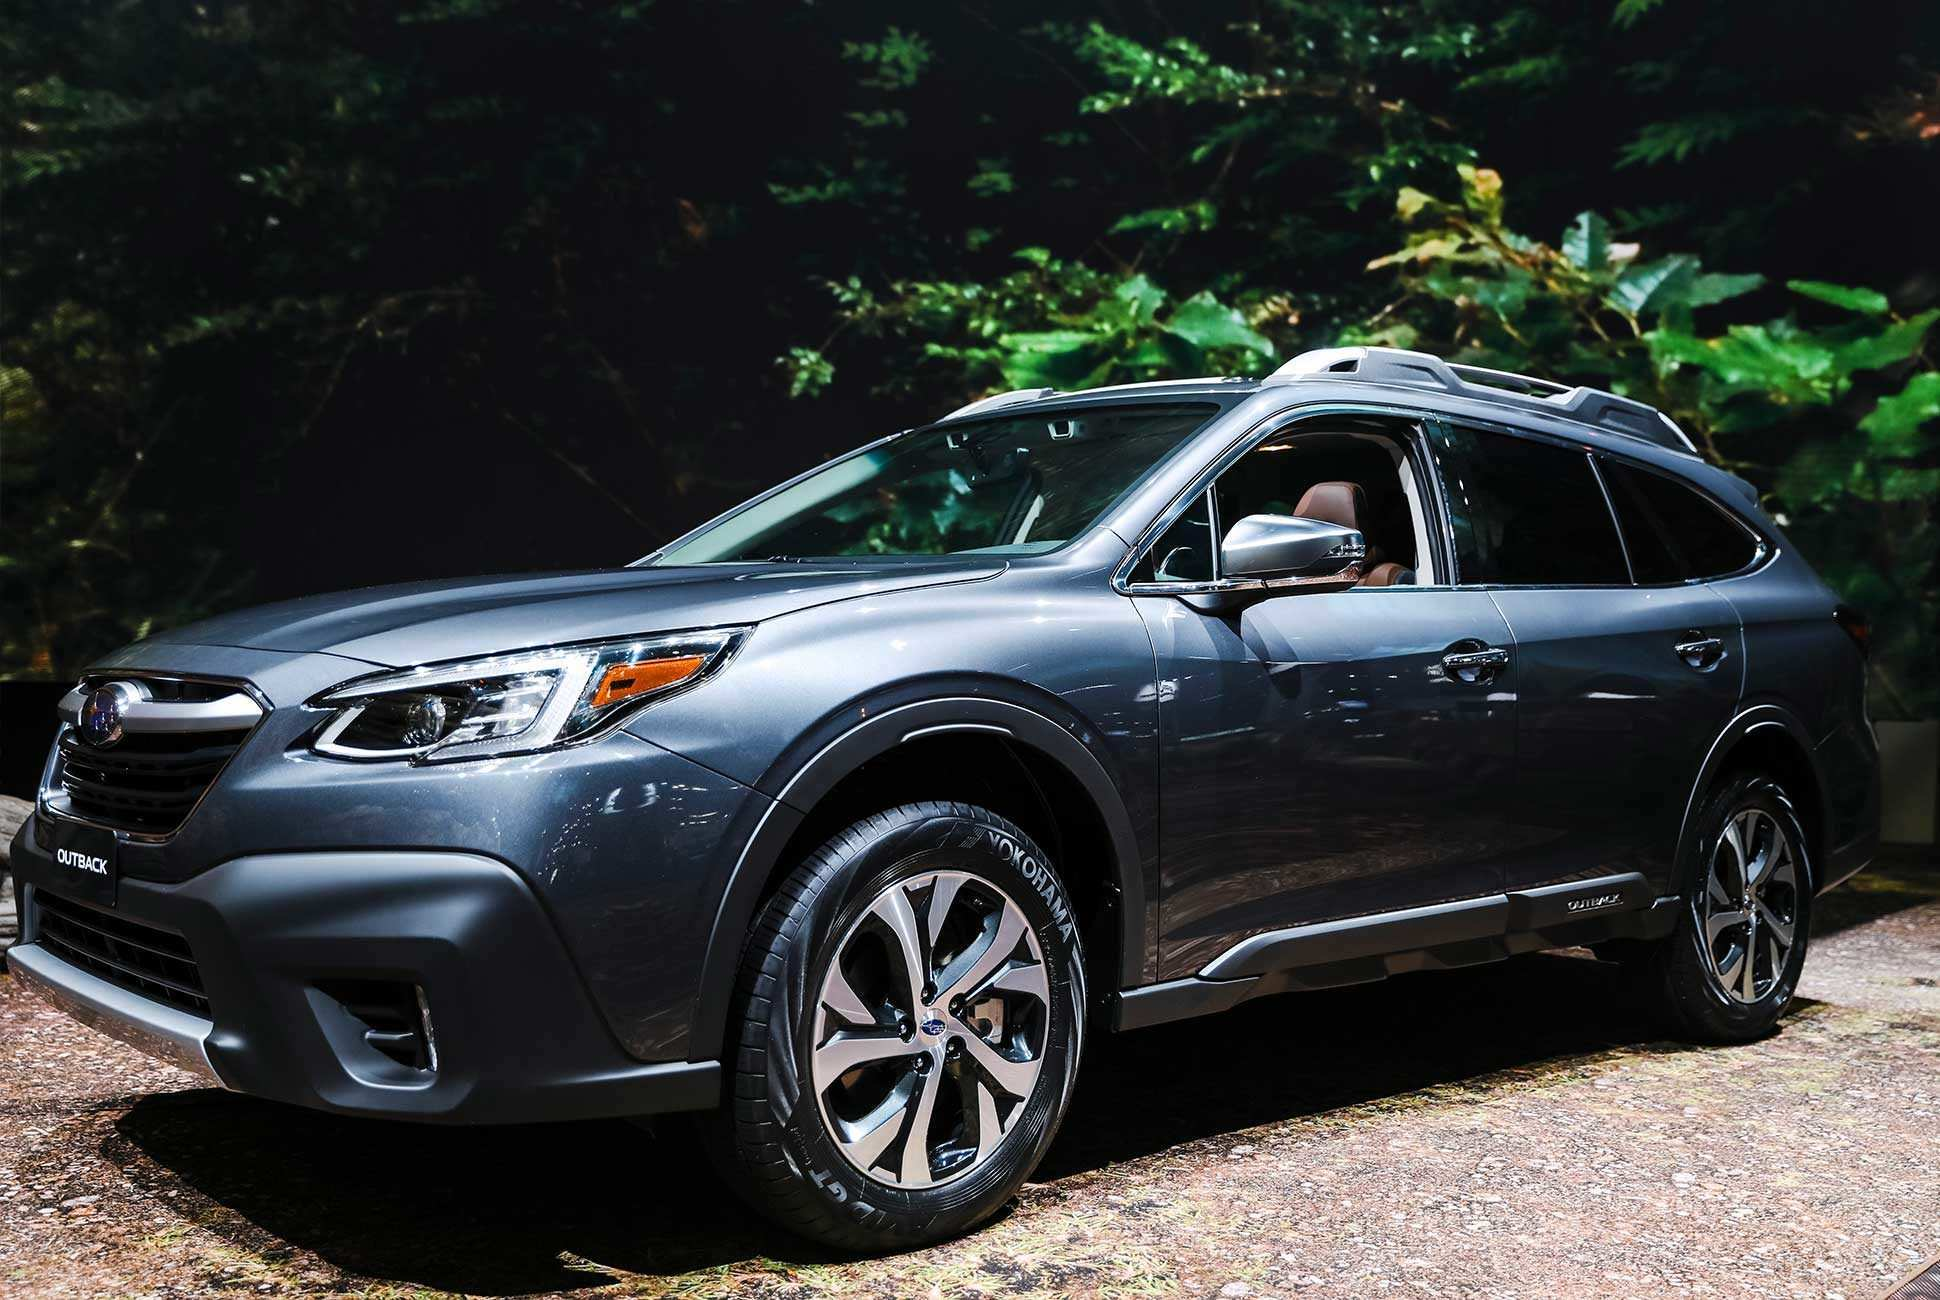 58 Great Subaru Outback 2020 Rumors by Subaru Outback 2020